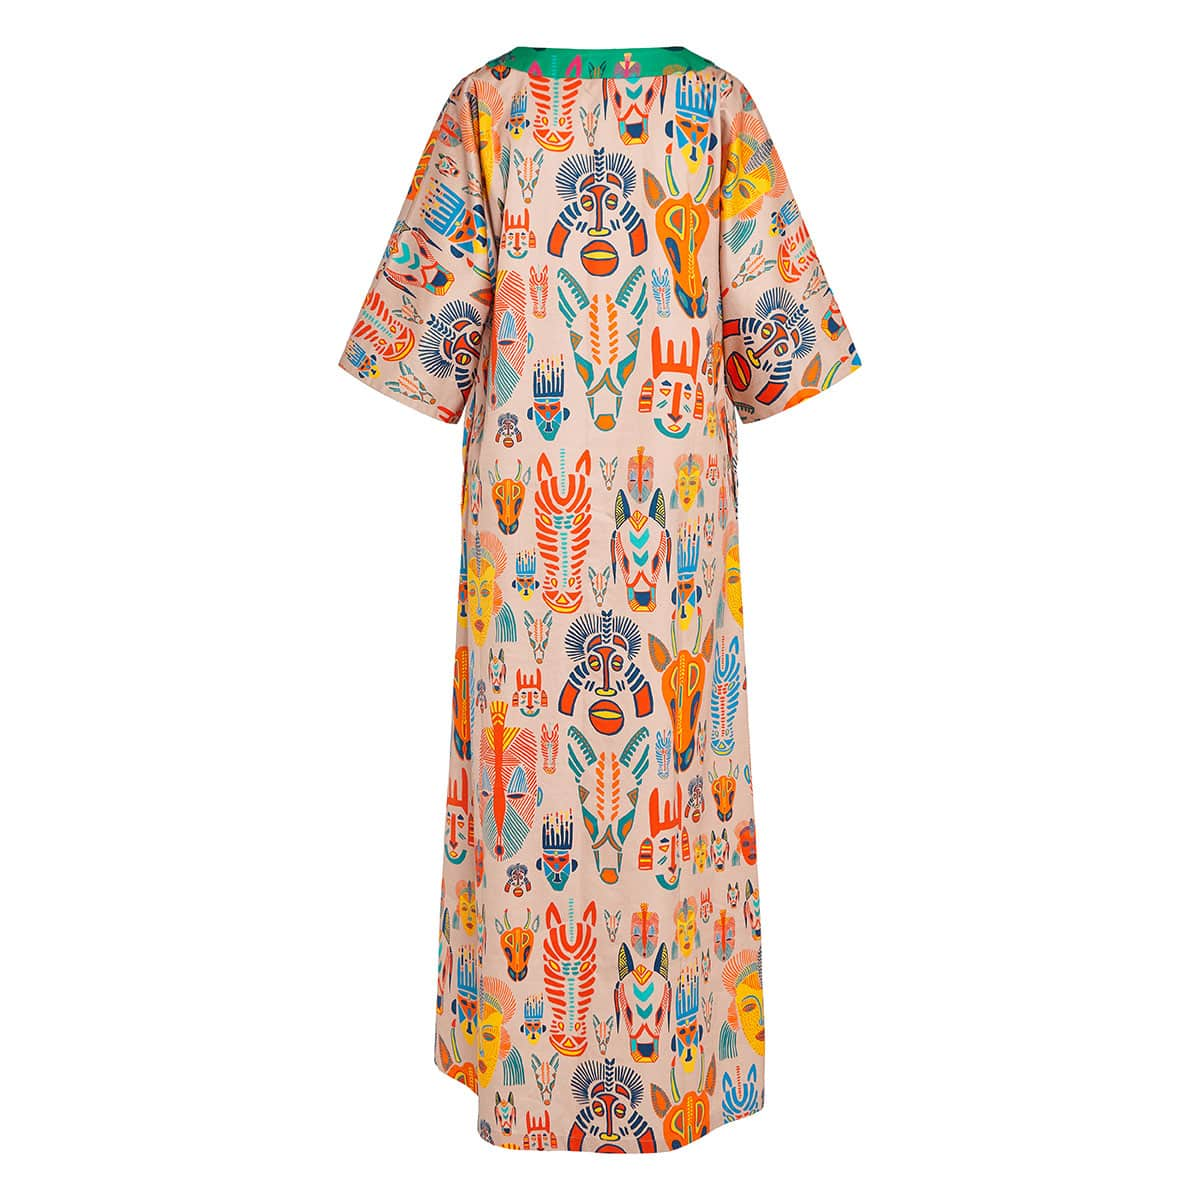 Patricia Carnaval long kaftan dress